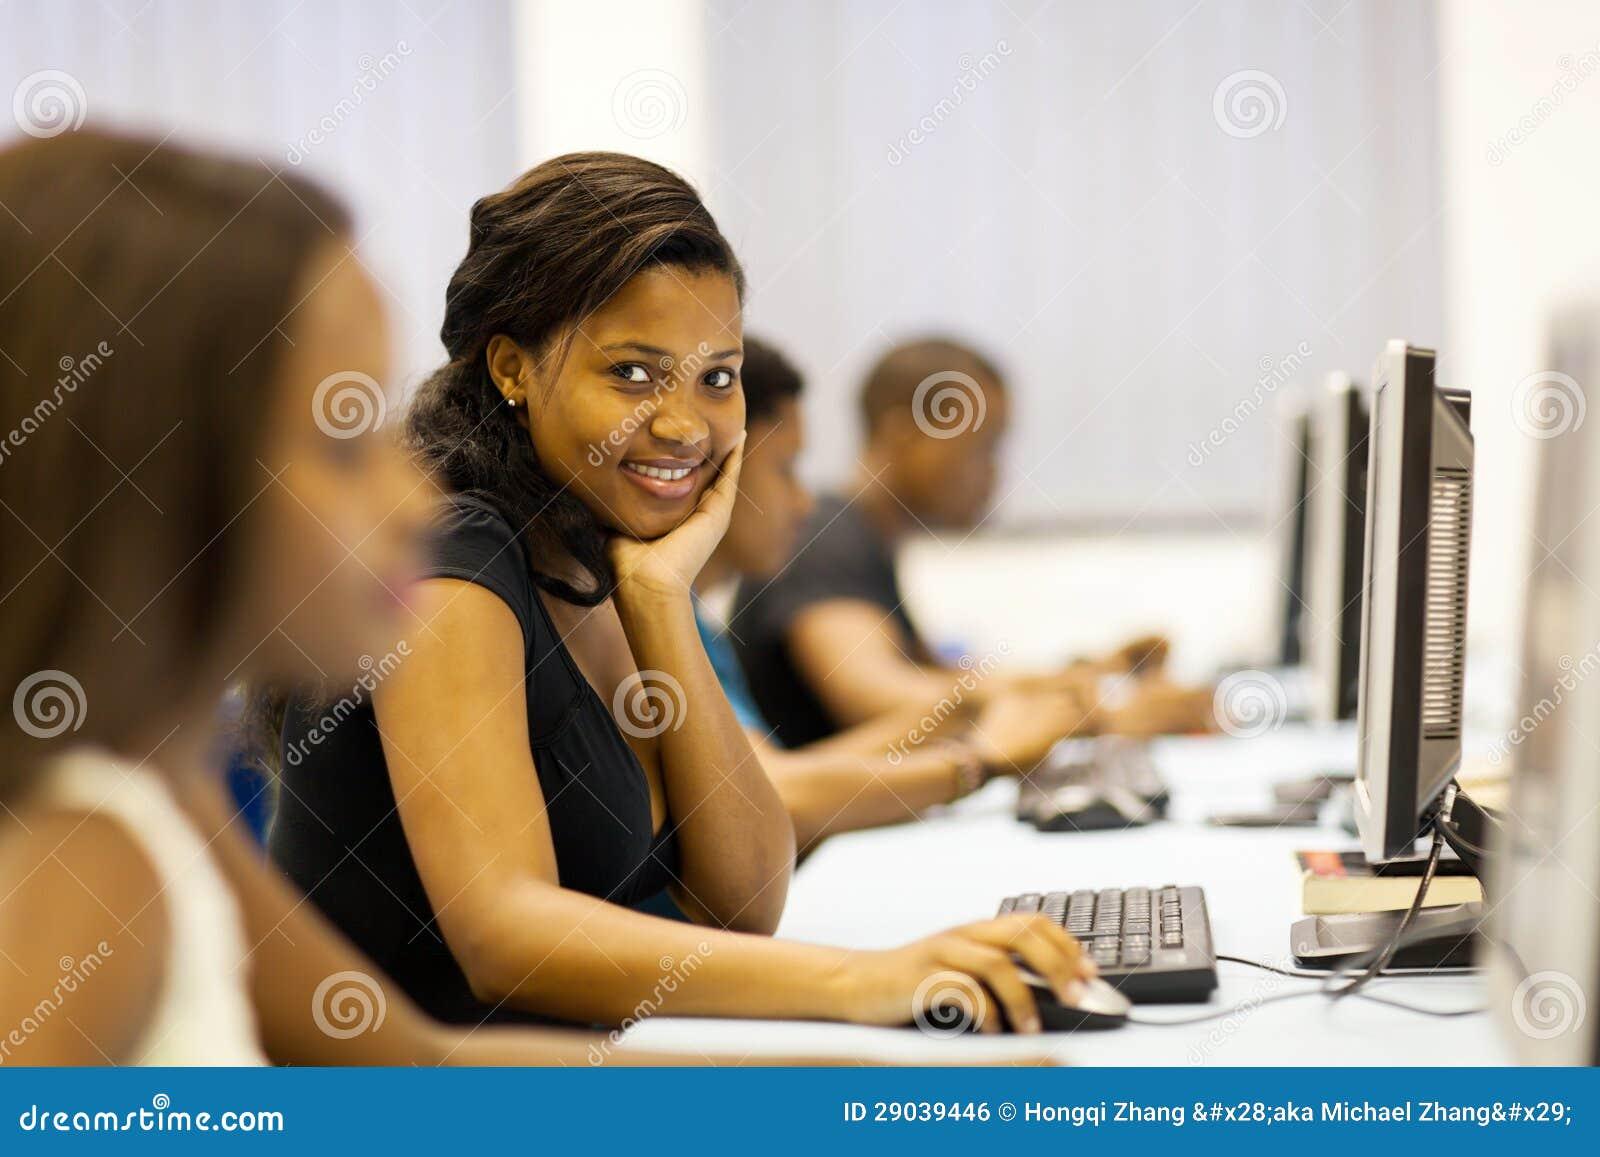 Students computer room